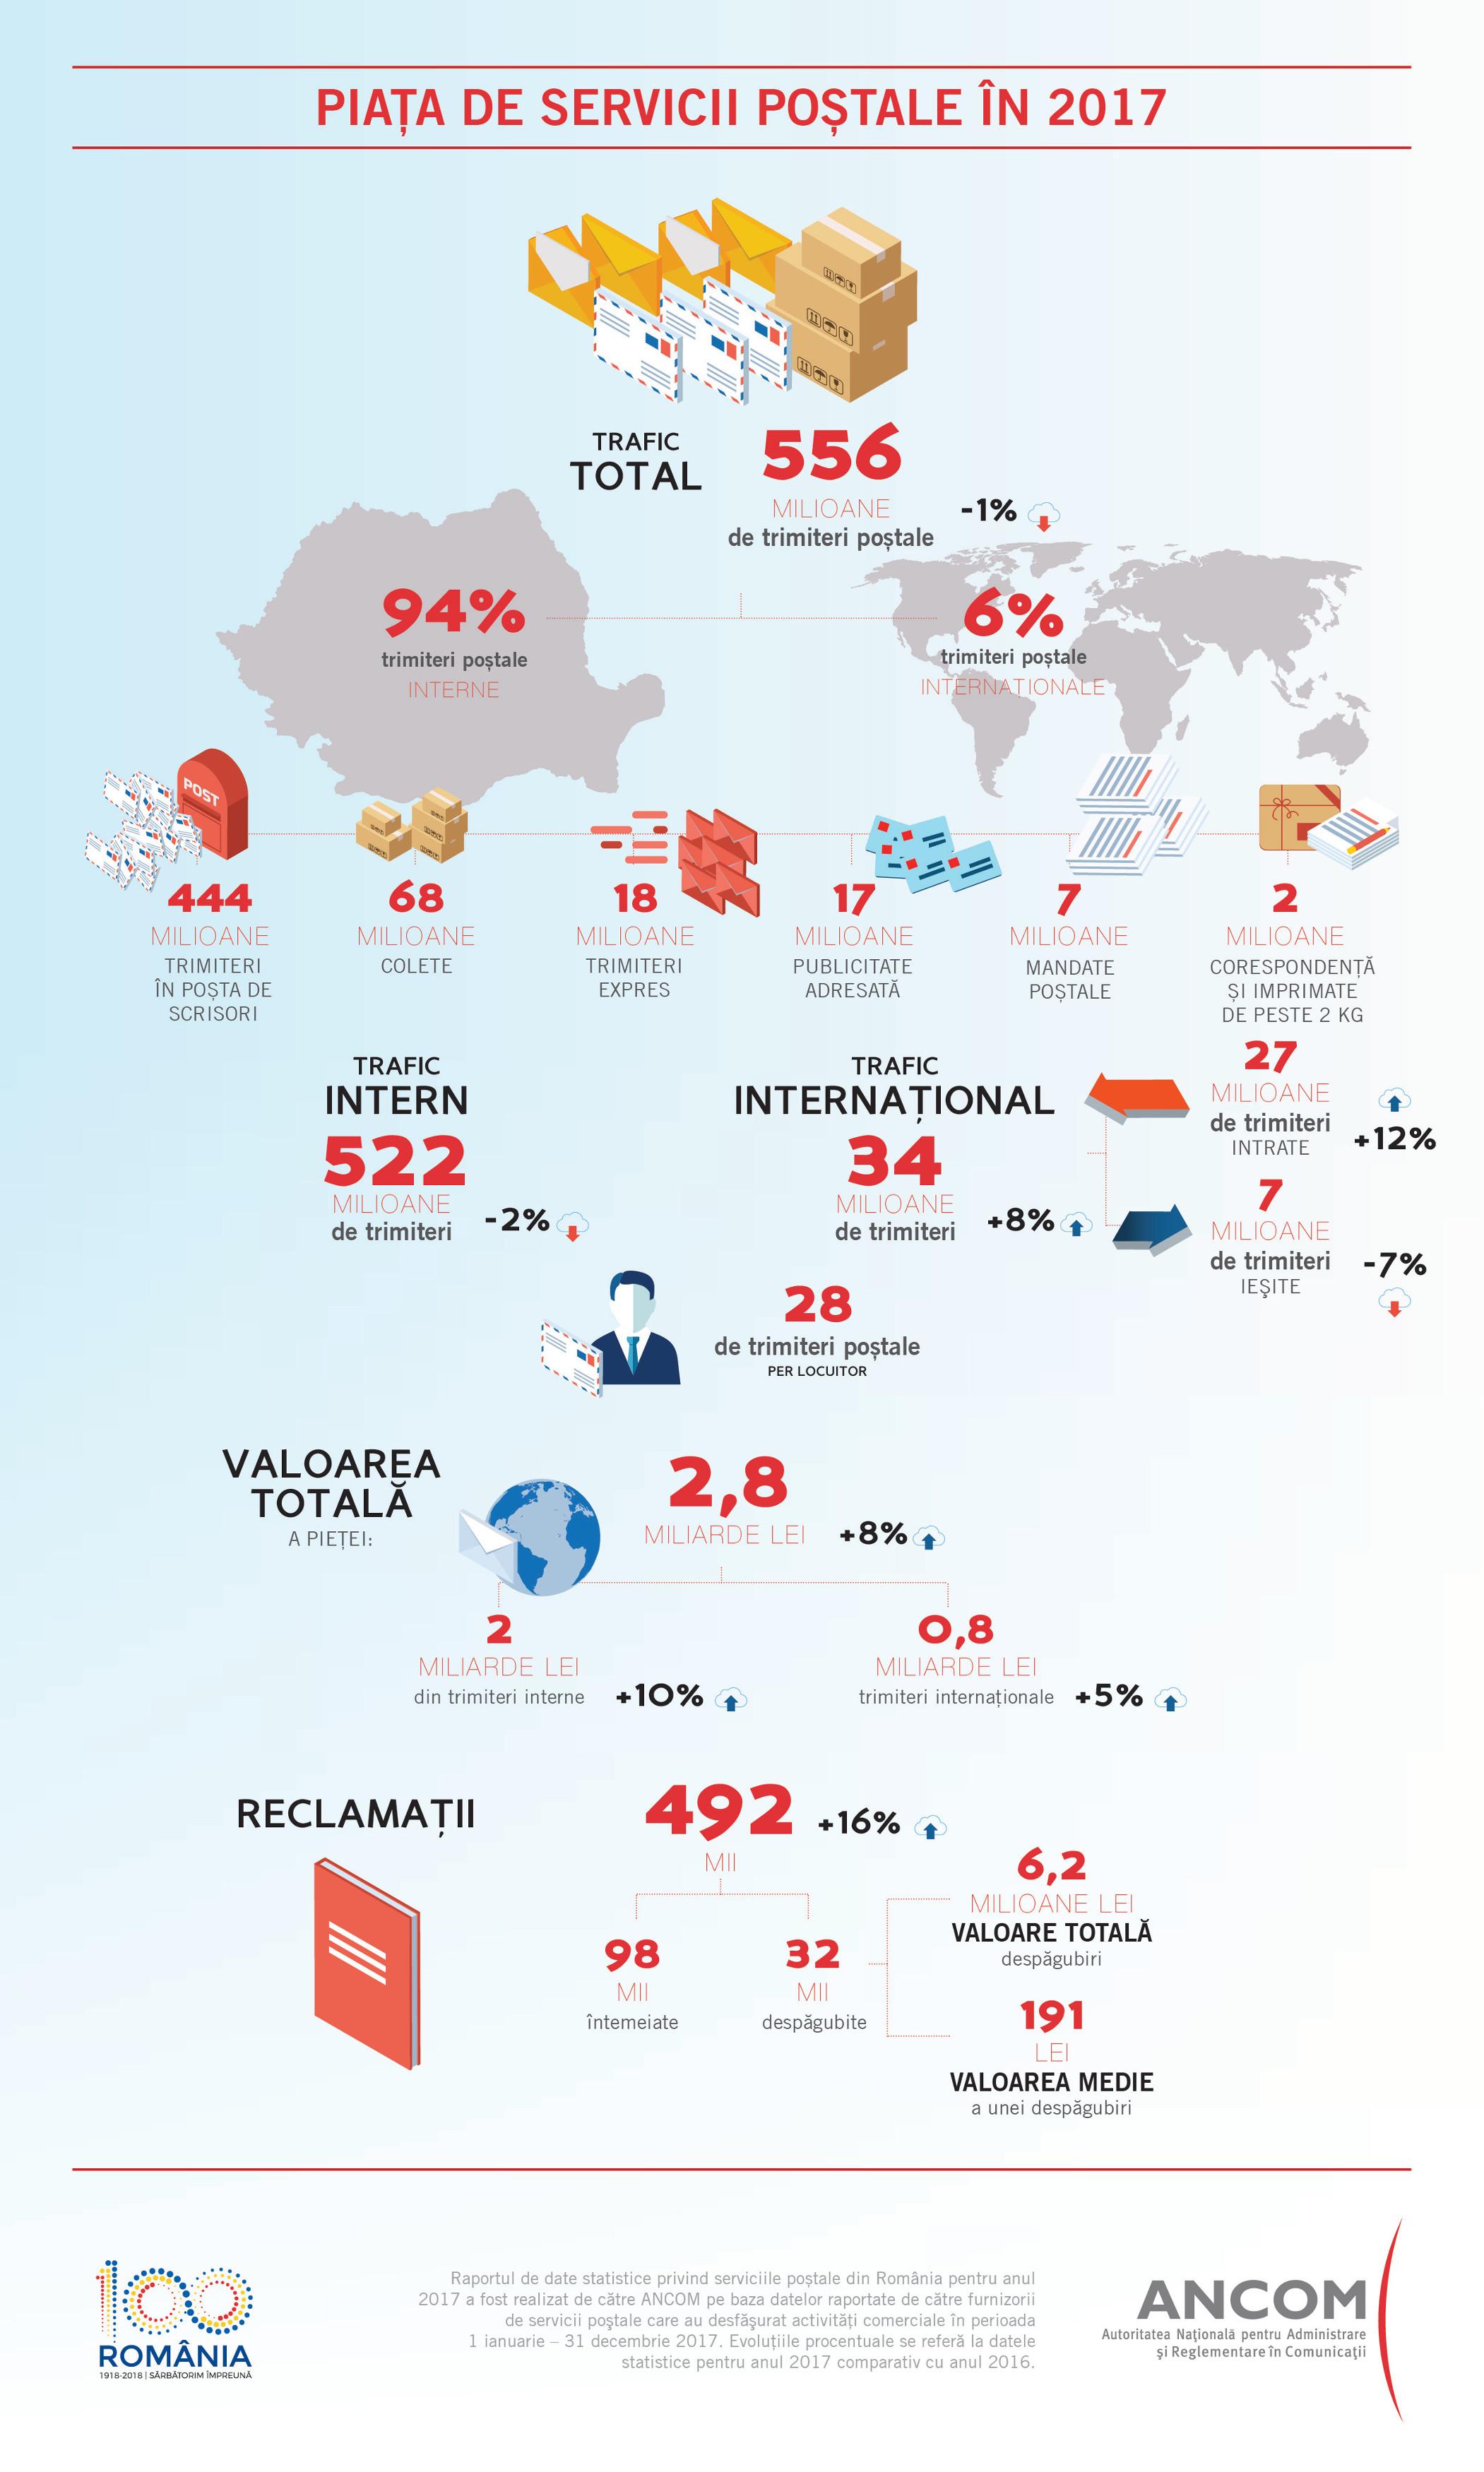 Infographic piata de servicii postale in 2017